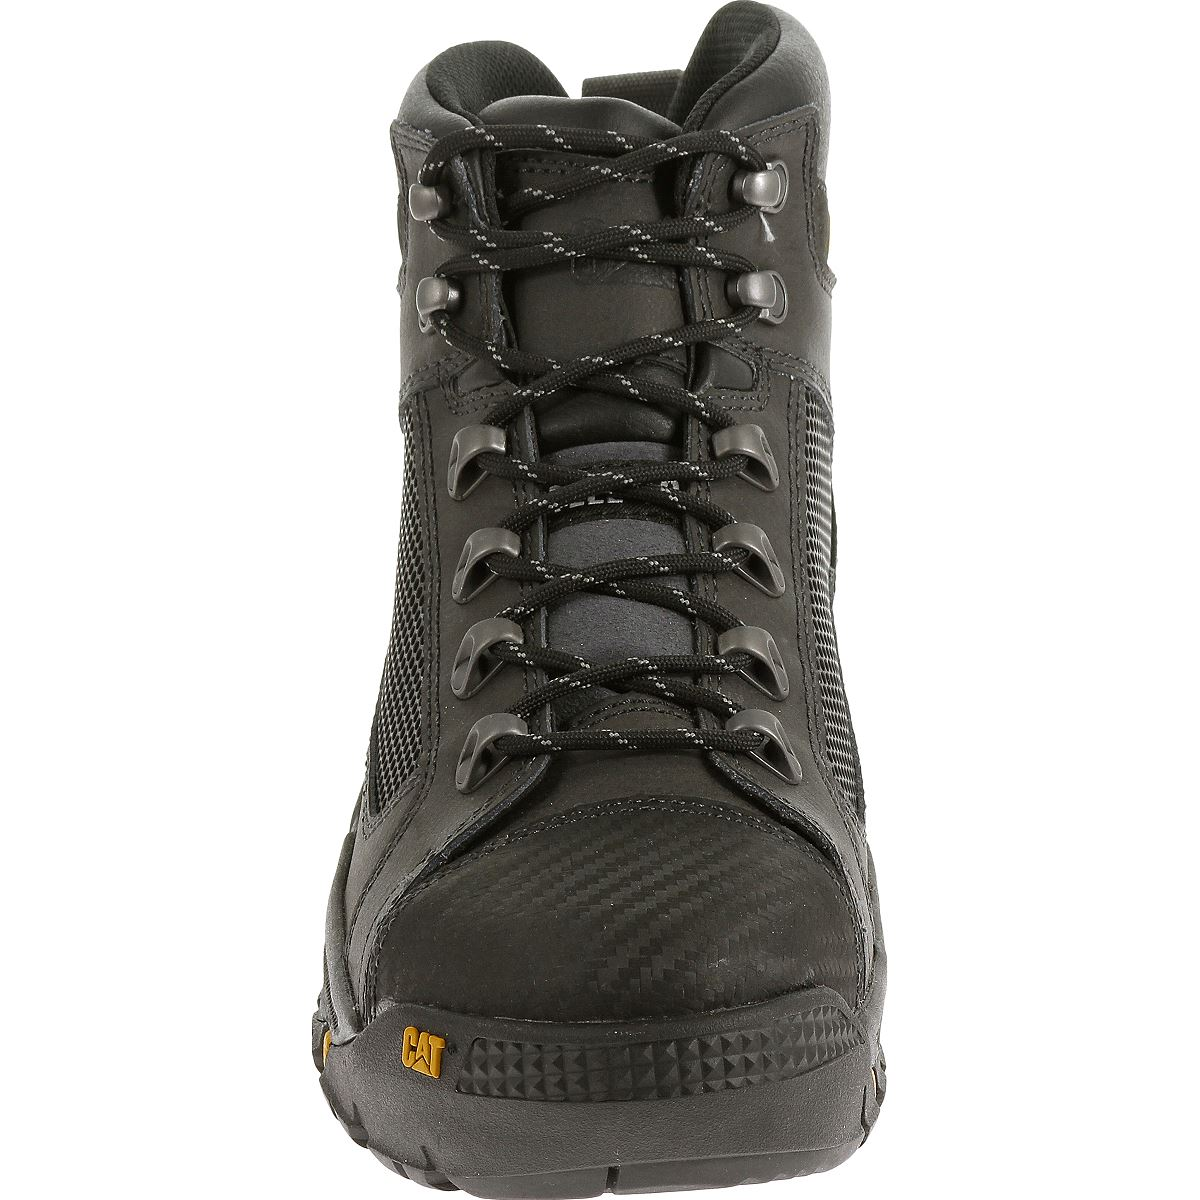 Cat Men S Convex Mid Steel Toe Work Shoes